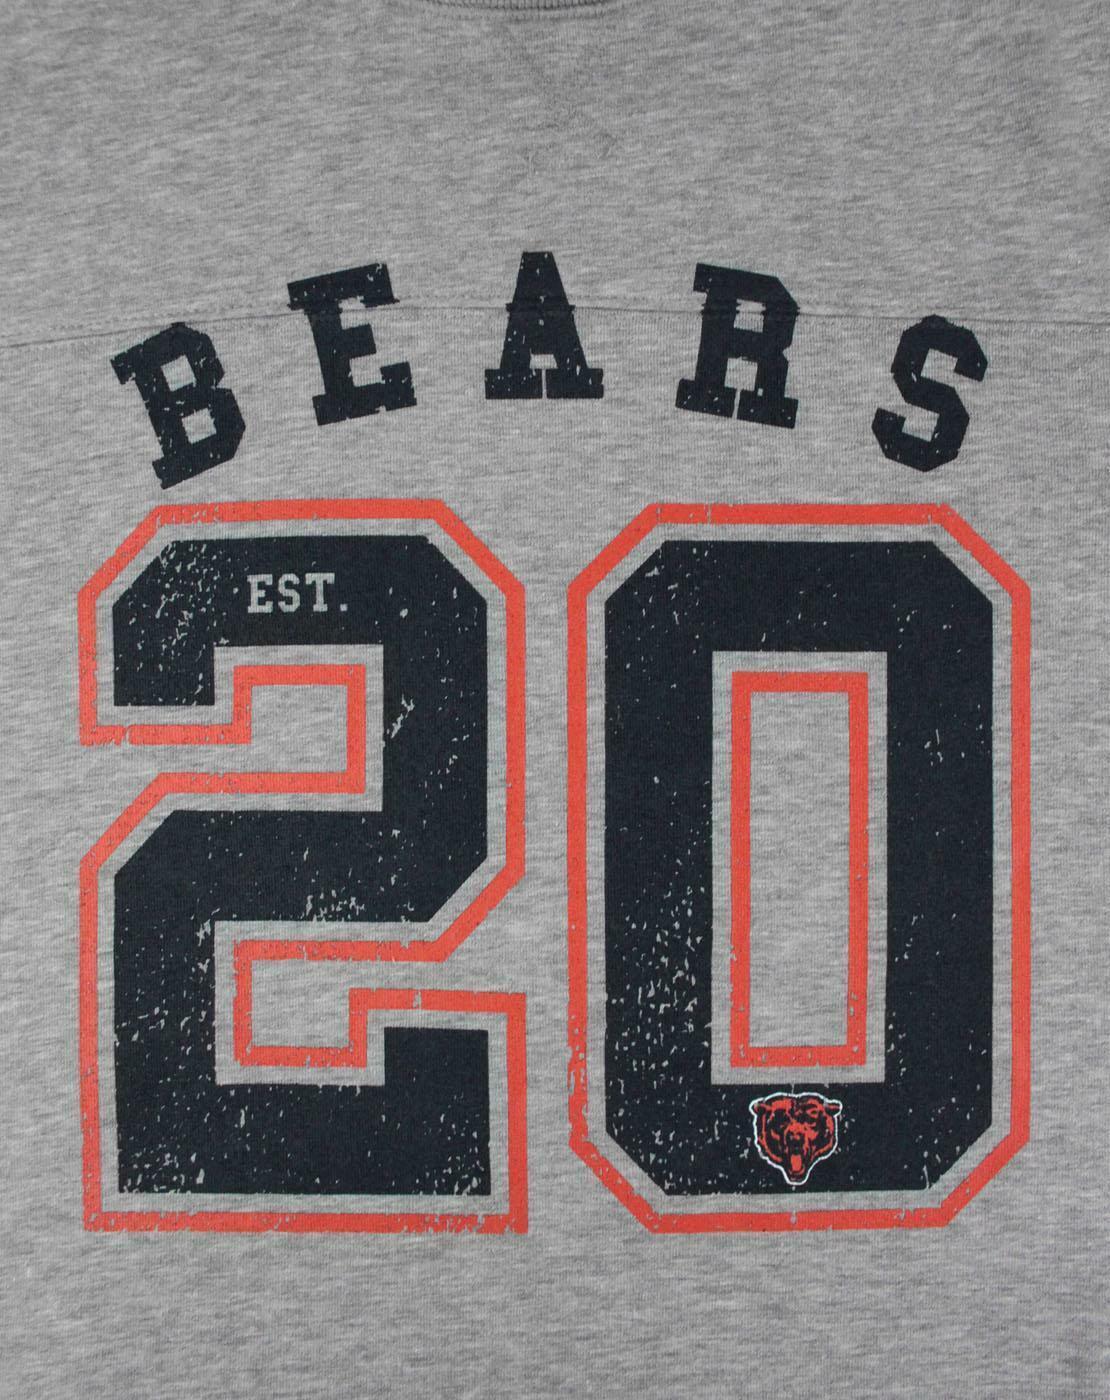 New-Era-NFL-Chicago-Bears-Vintage-Number-Men-039-s-Sweater miniatura 7